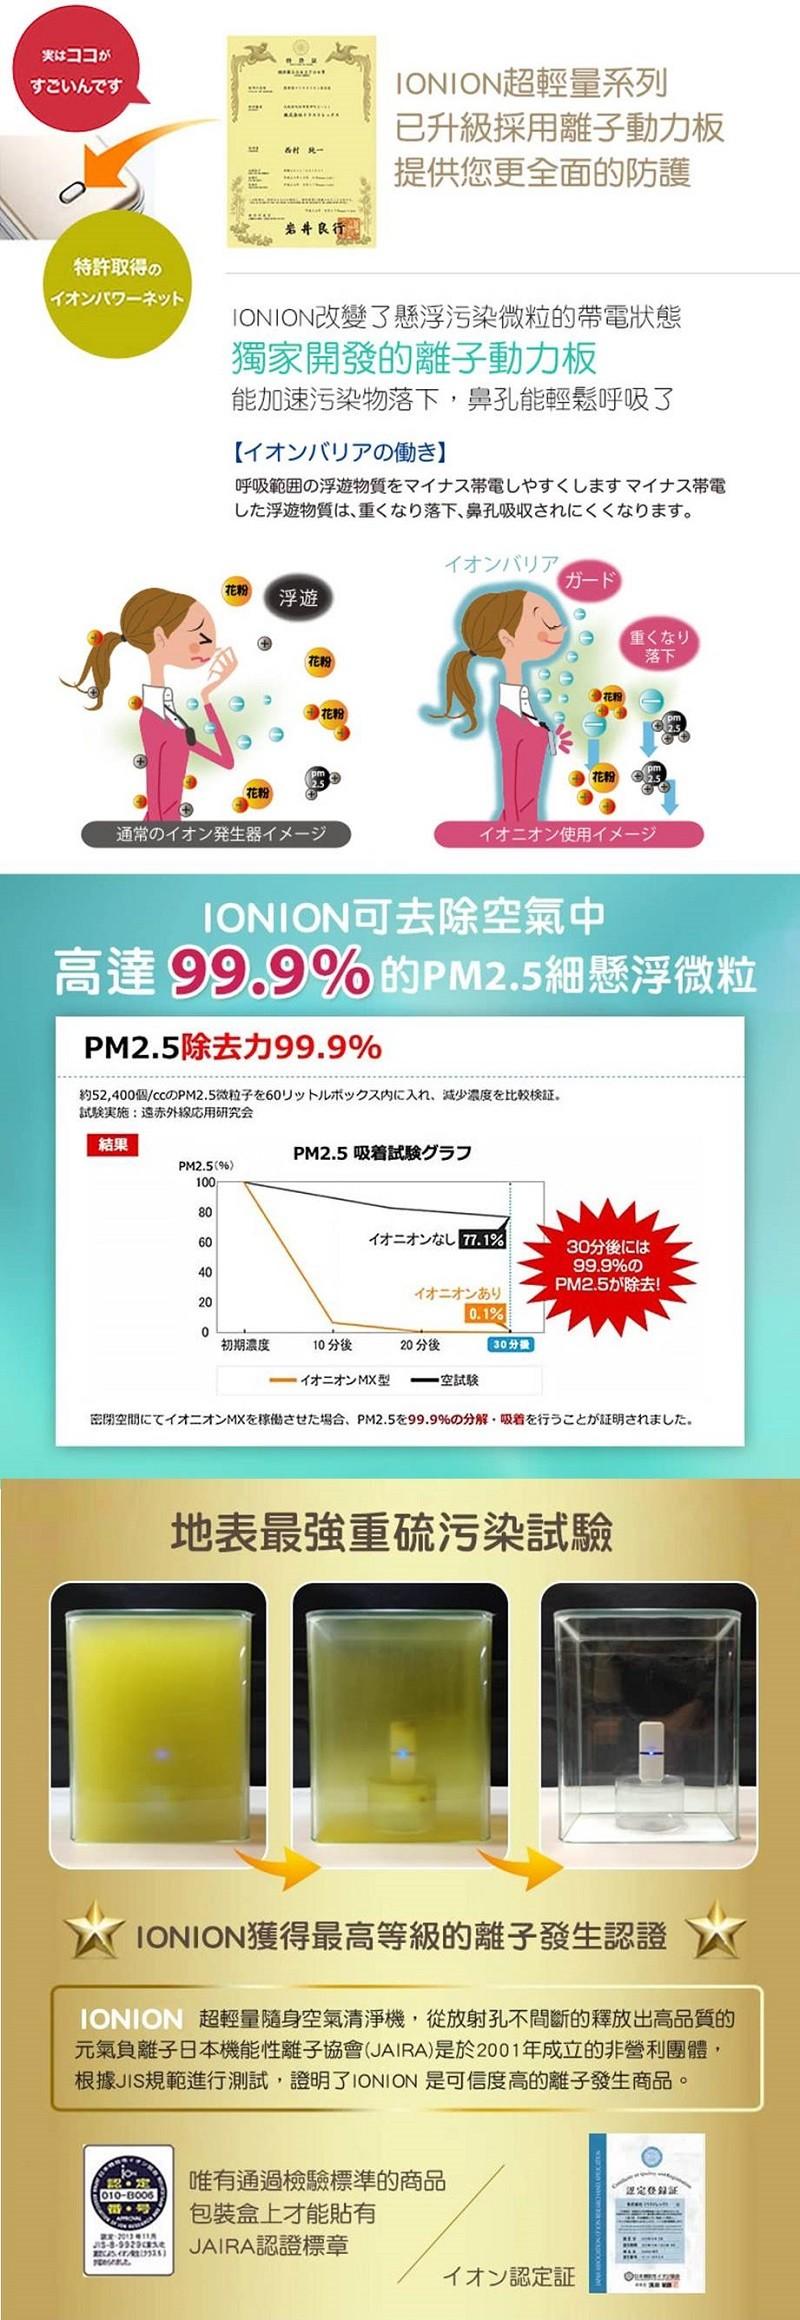 IONION MX超輕量隨身空氣清淨機 最新升級版 香港行貨